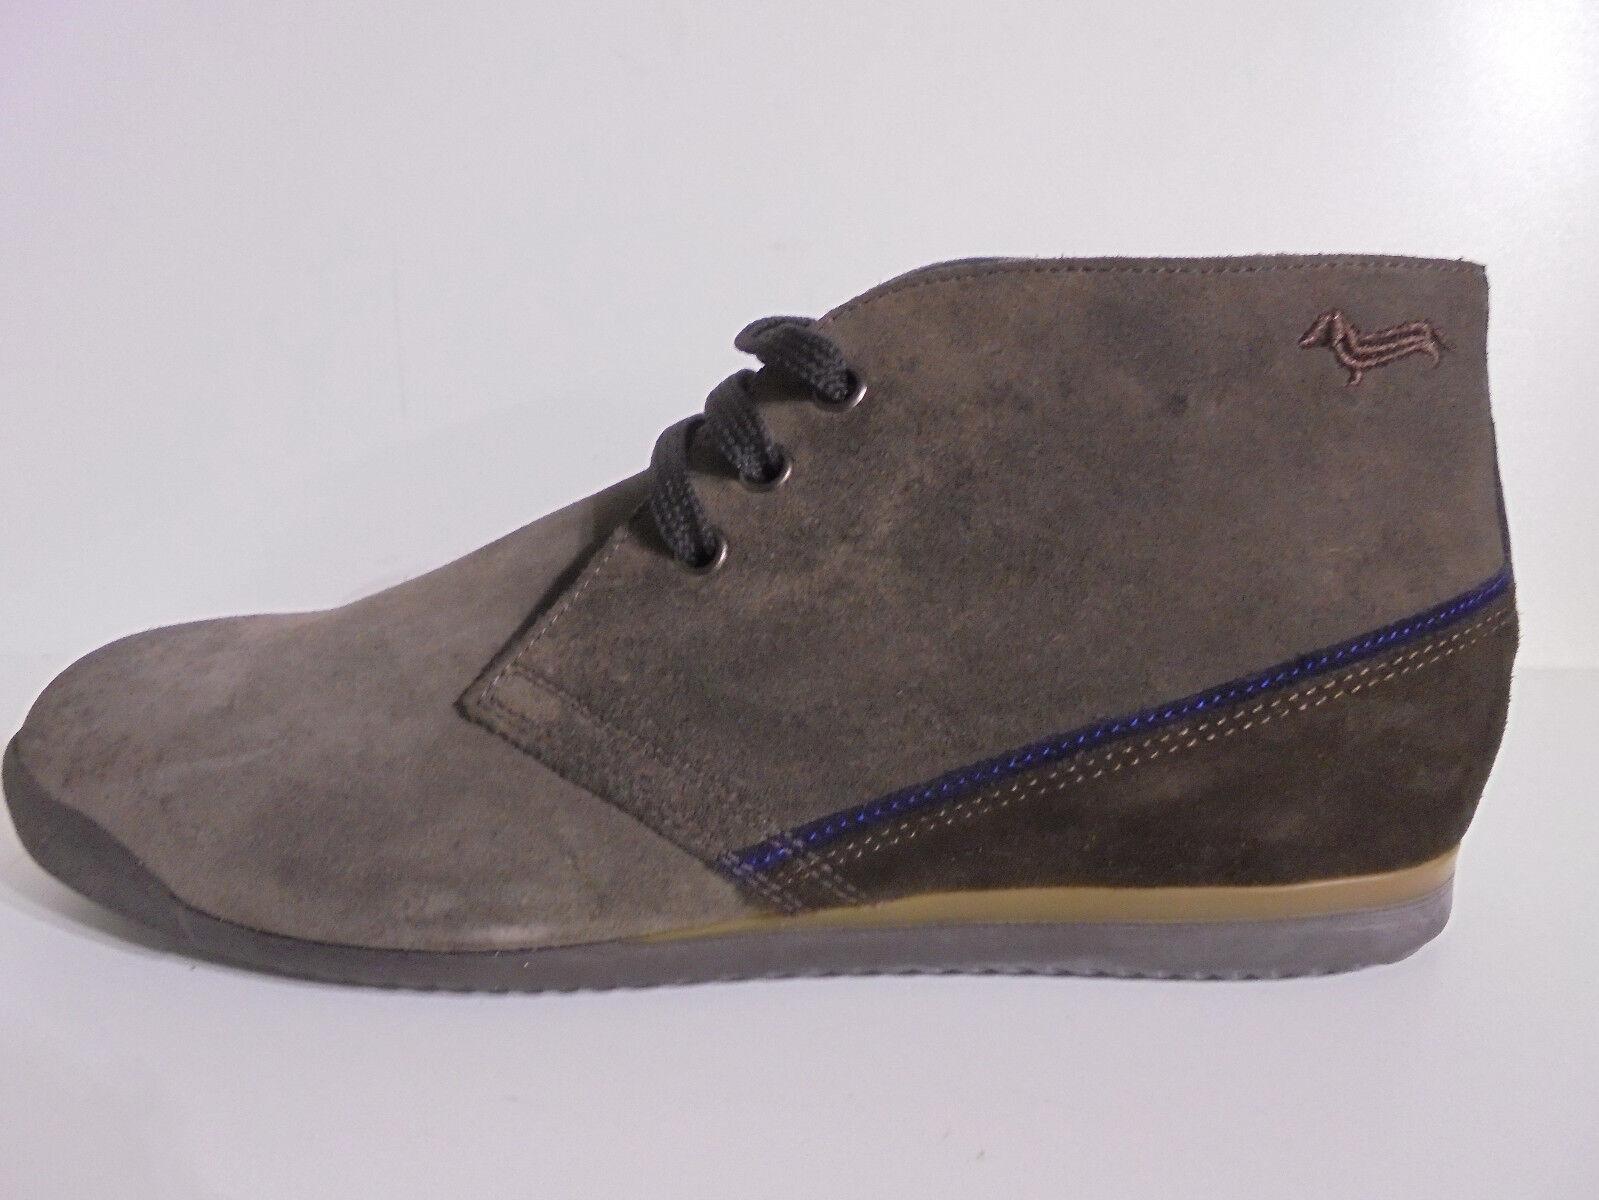 Herren Schuhe E8022601 Harmont&Blain Rabatt. - 65%Nr. E8022601 Schuhe Far. braun 13297a